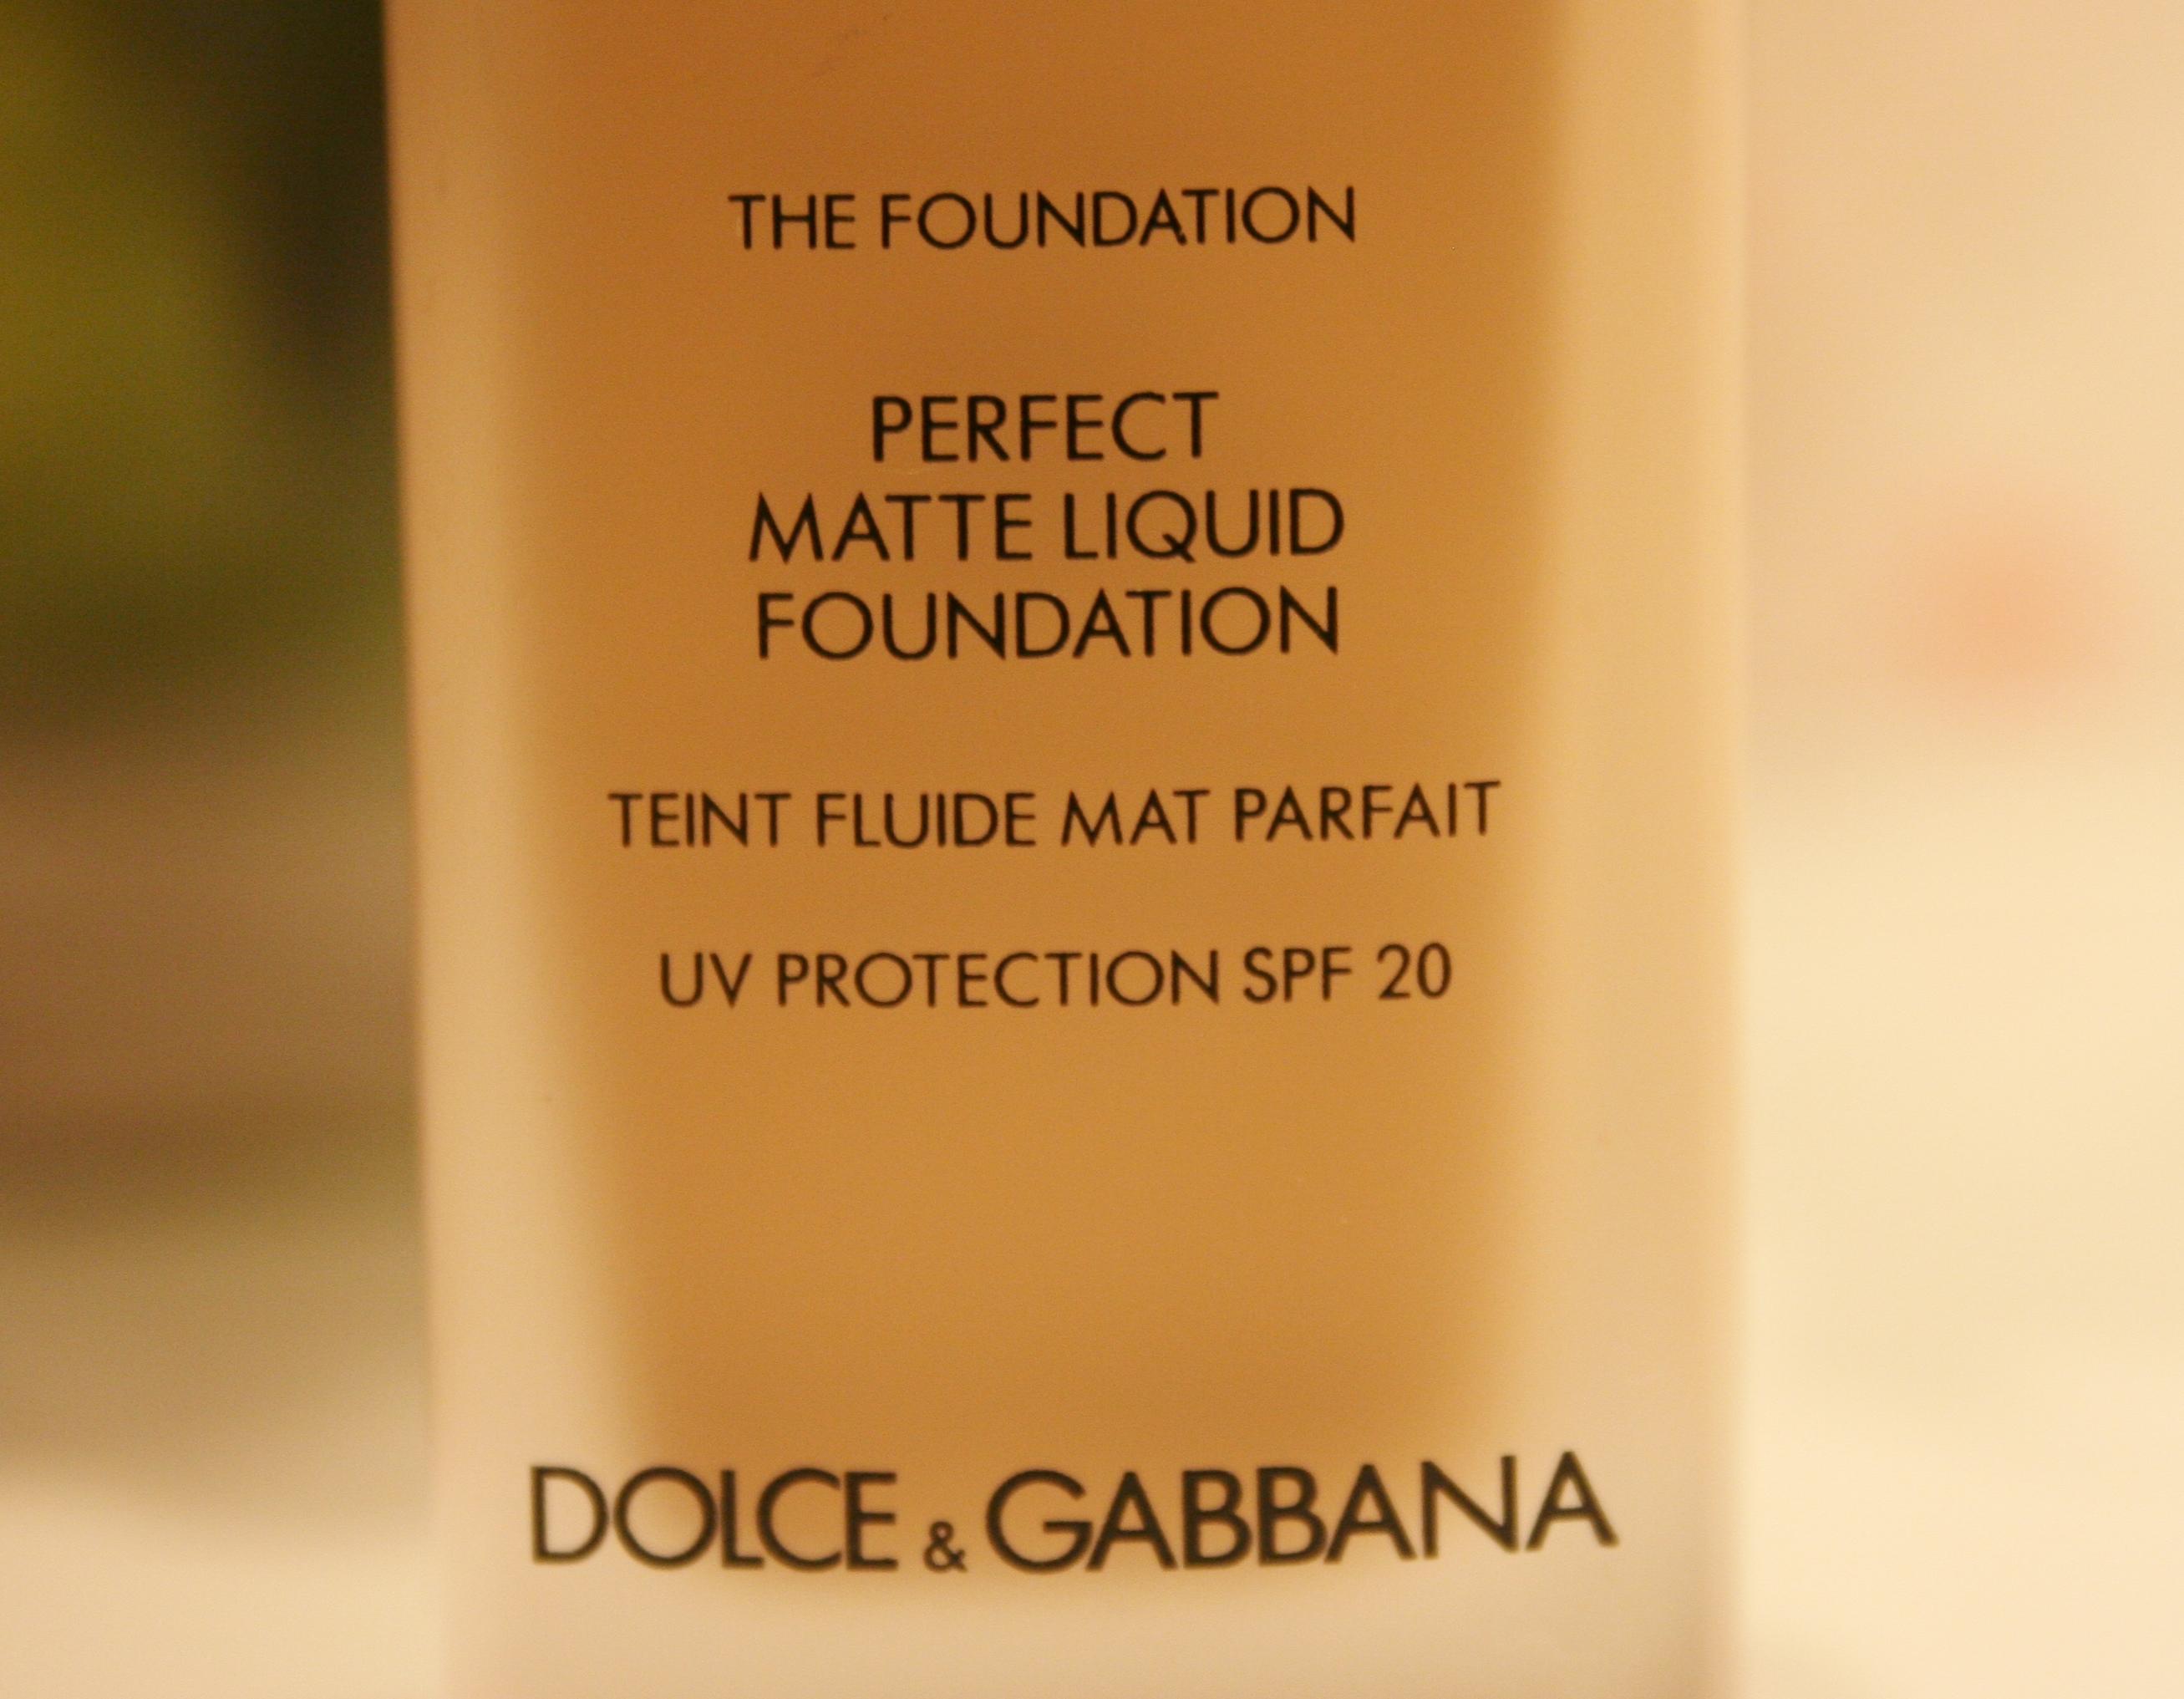 c5a2ac14439a1 Dolce   Gabbana NEW Perfect Matte Liquid Foundation Review ...